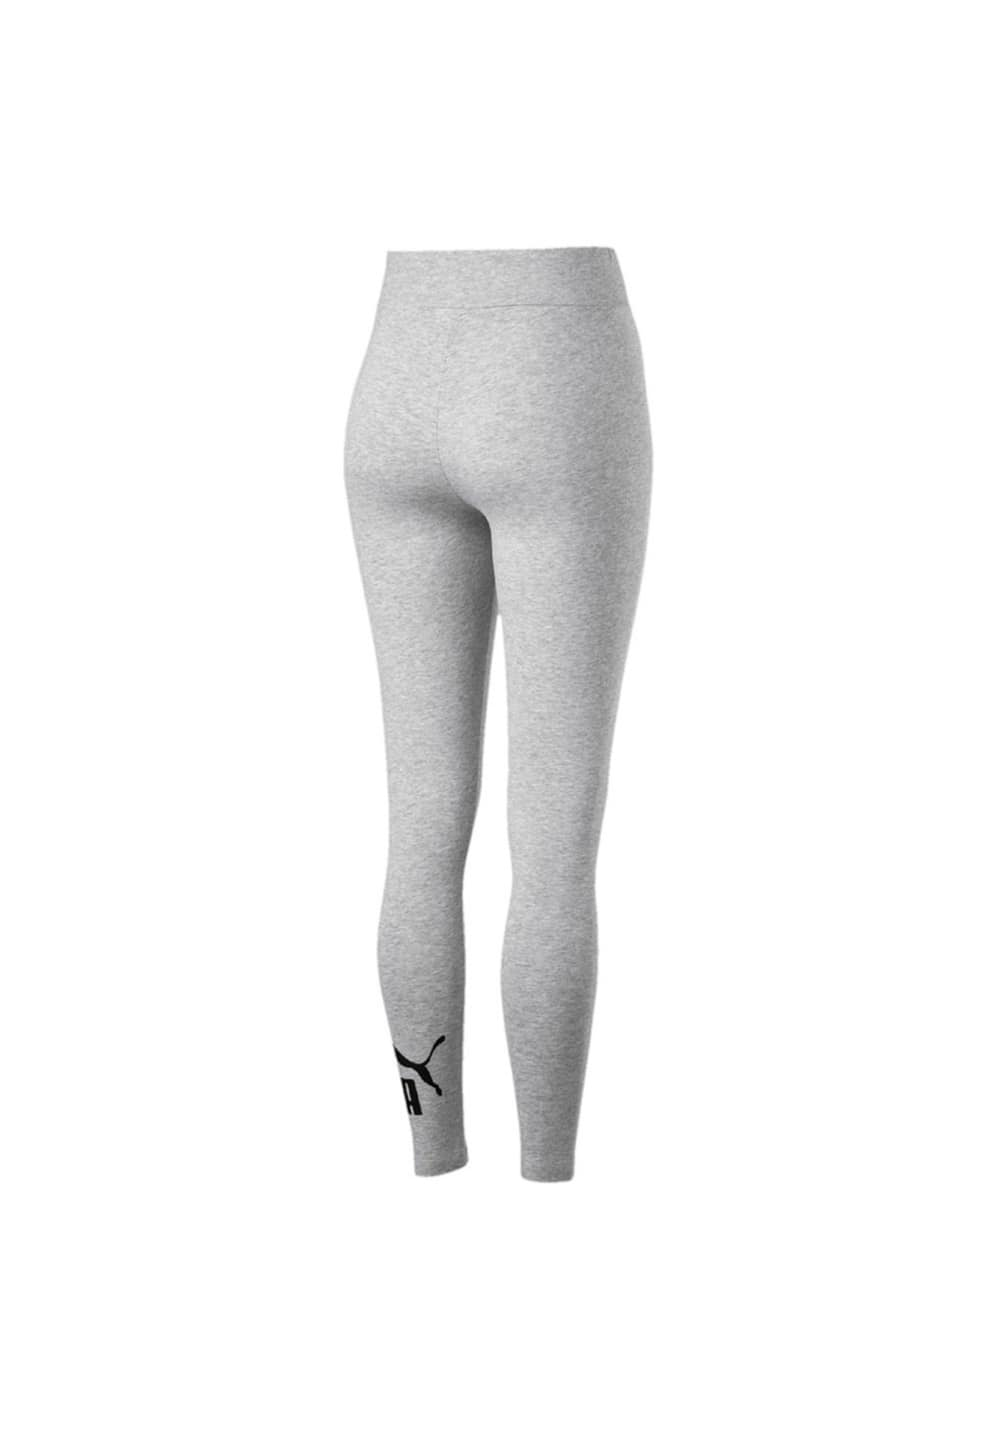 puma-essential-logo-leggings-pantalons-course-femme-gris -pid-0002000718501.jpg 91ec4c53b05